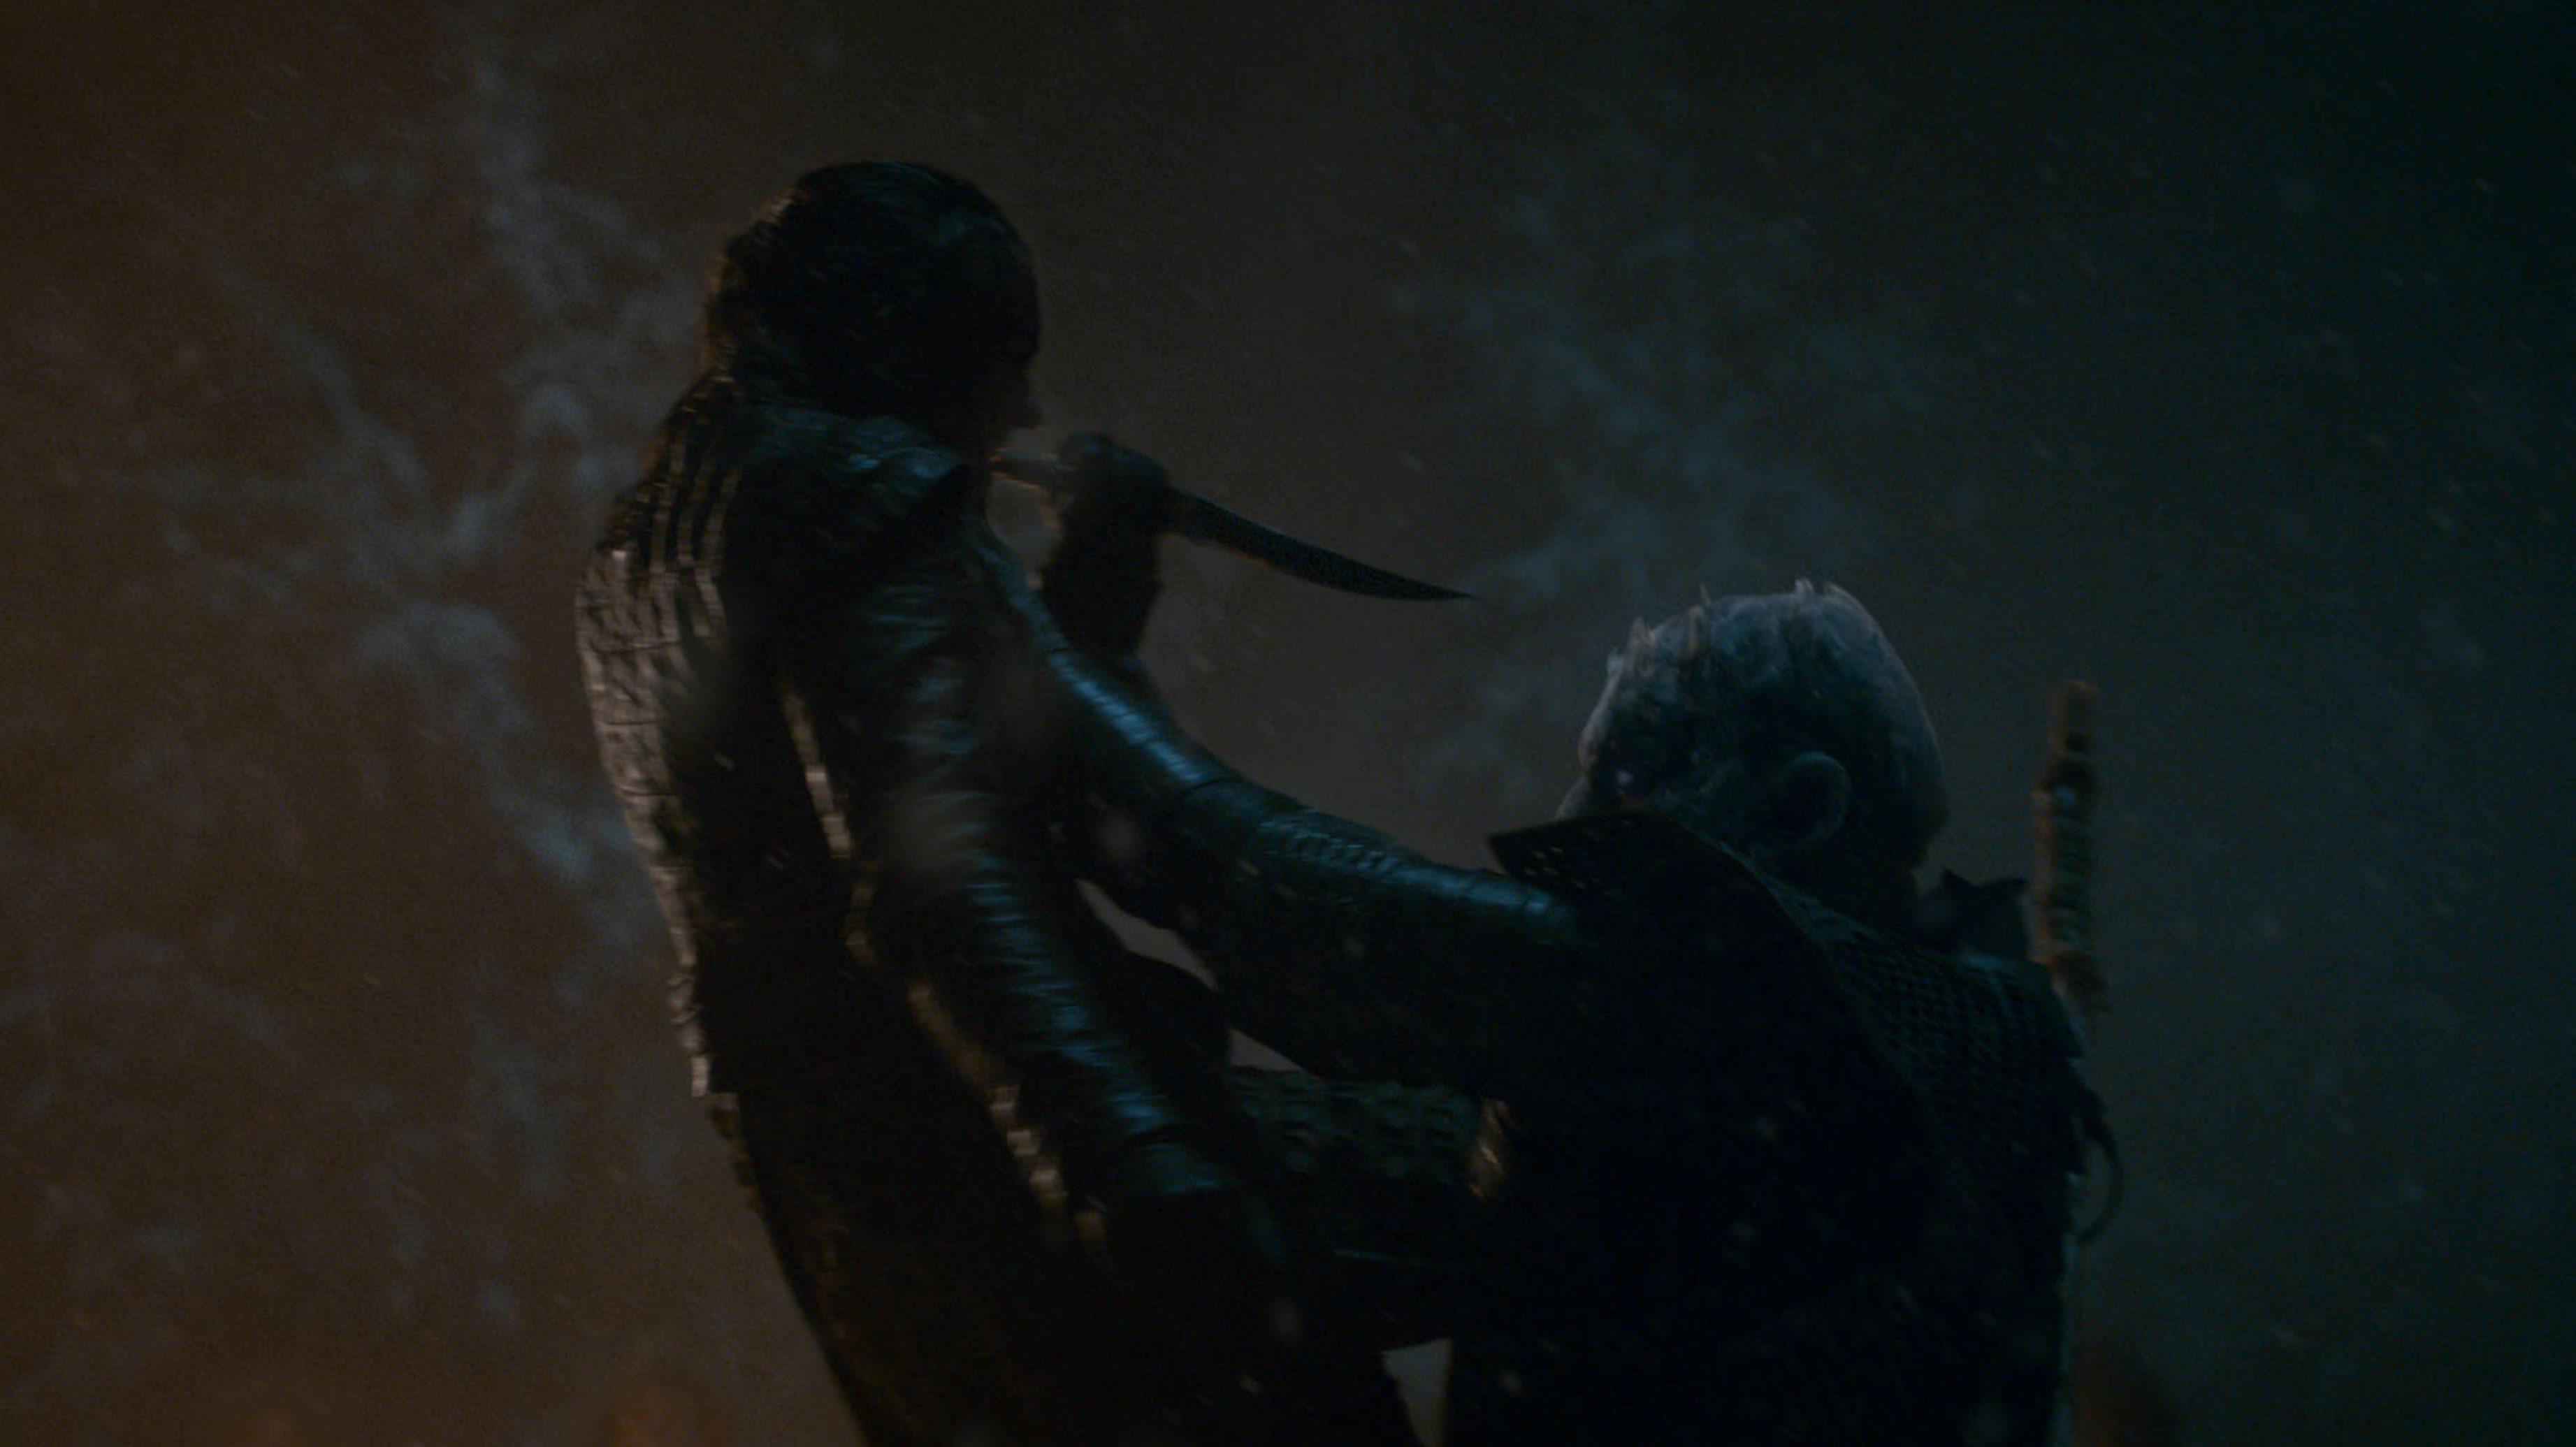 Game of thrones season 8 episode 2 end credits song